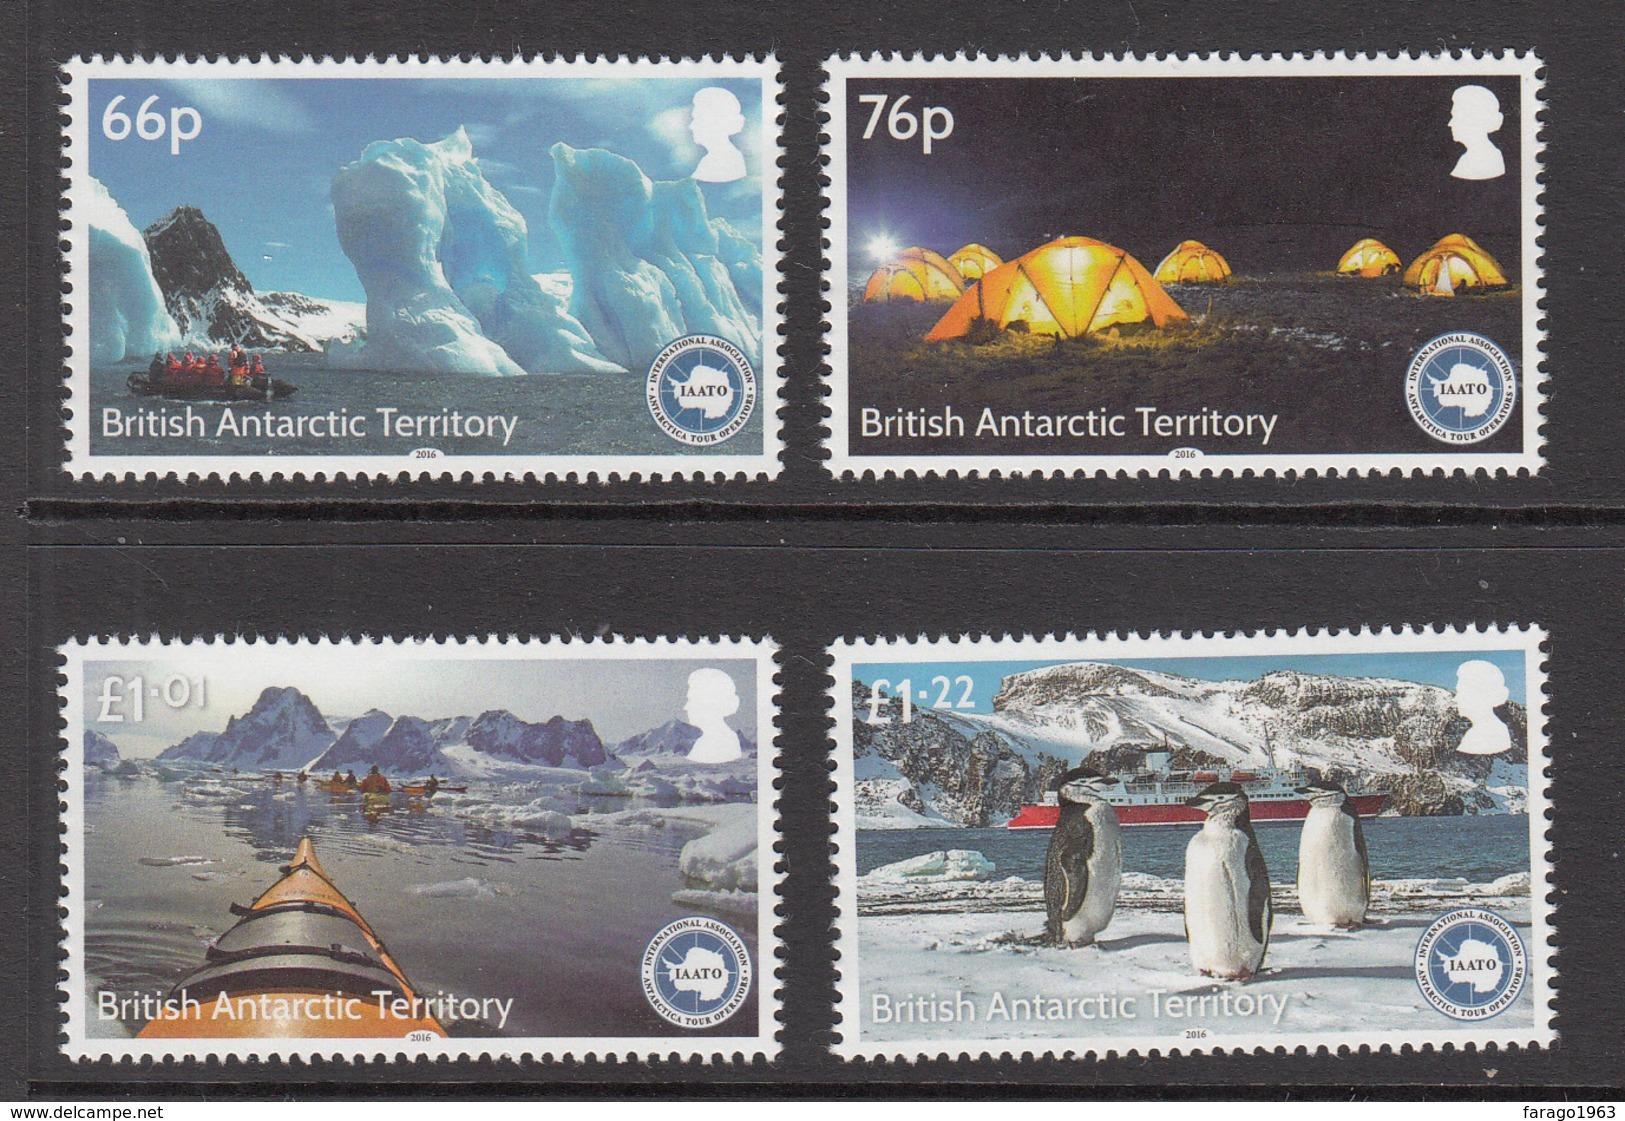 2016 British Antarctic Territory Tourism Penguins Kayaks Cruise Ship  Complete Set Of 4   MNH - Britisches Antarktis-Territorium  (BAT)